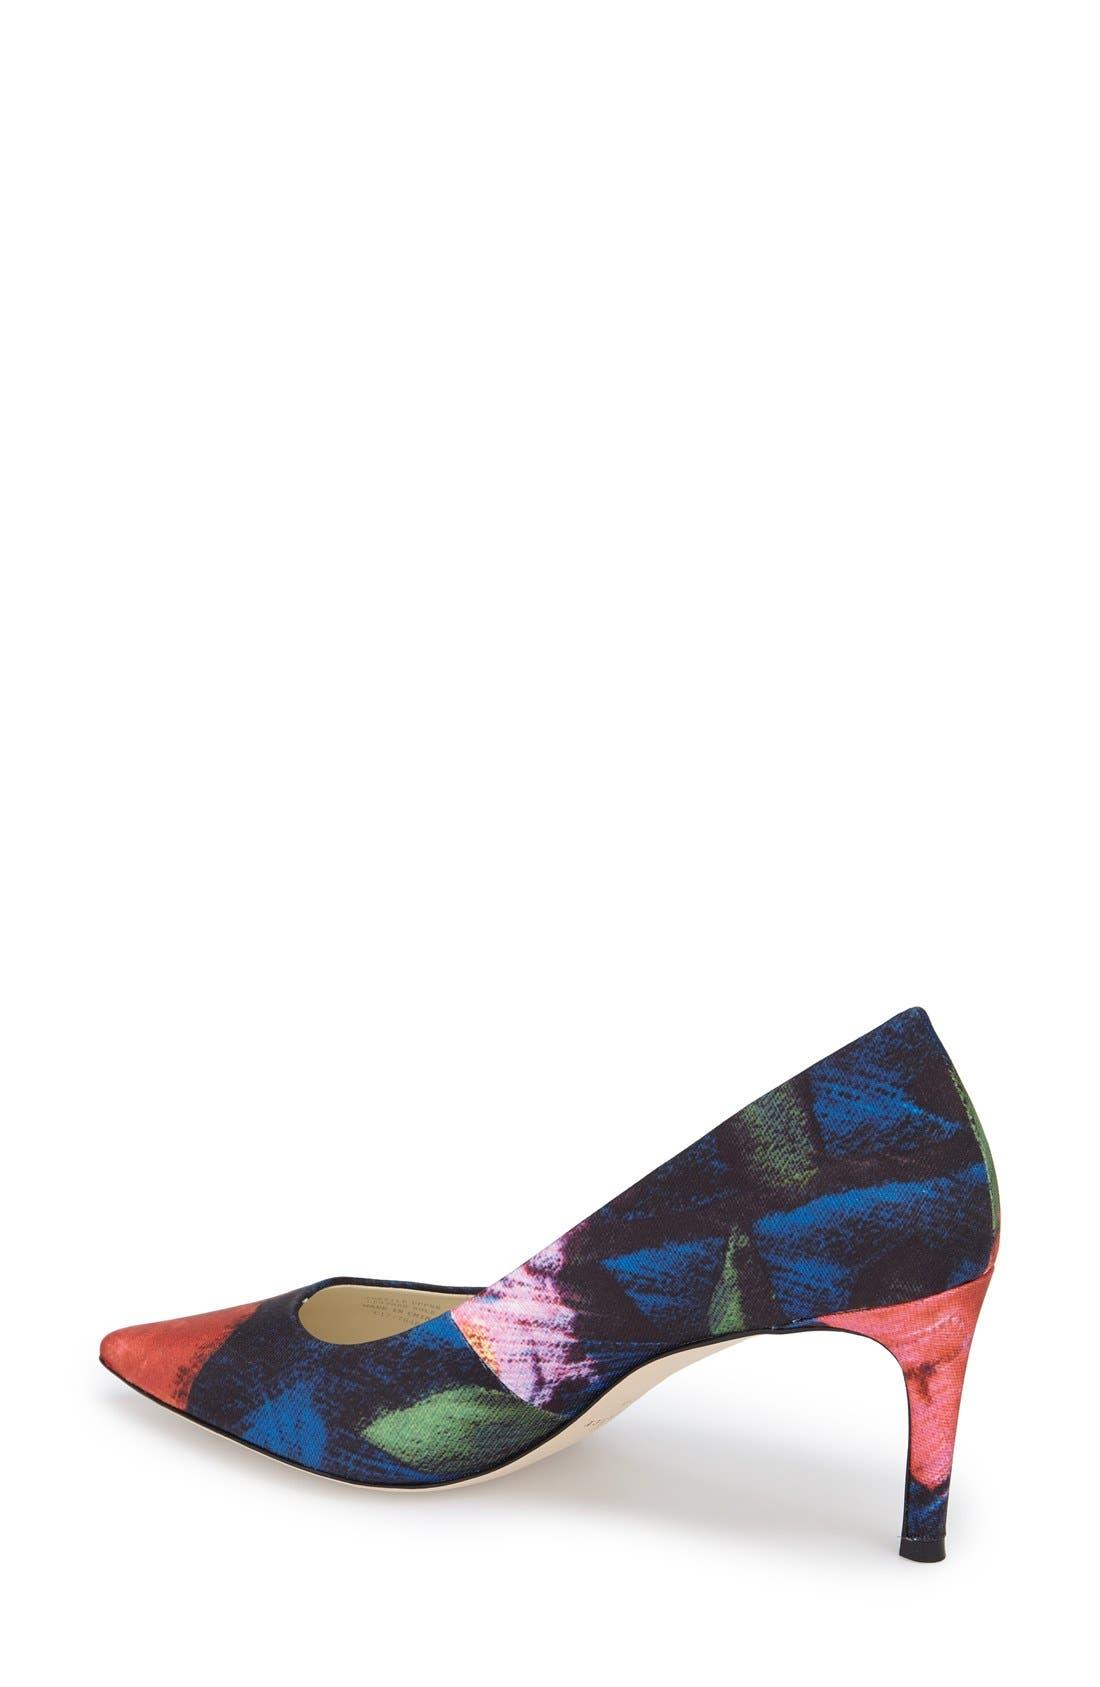 Alternate Image 2  - Bettye Muller 'Annie' Pointy Toe Pump (Women)